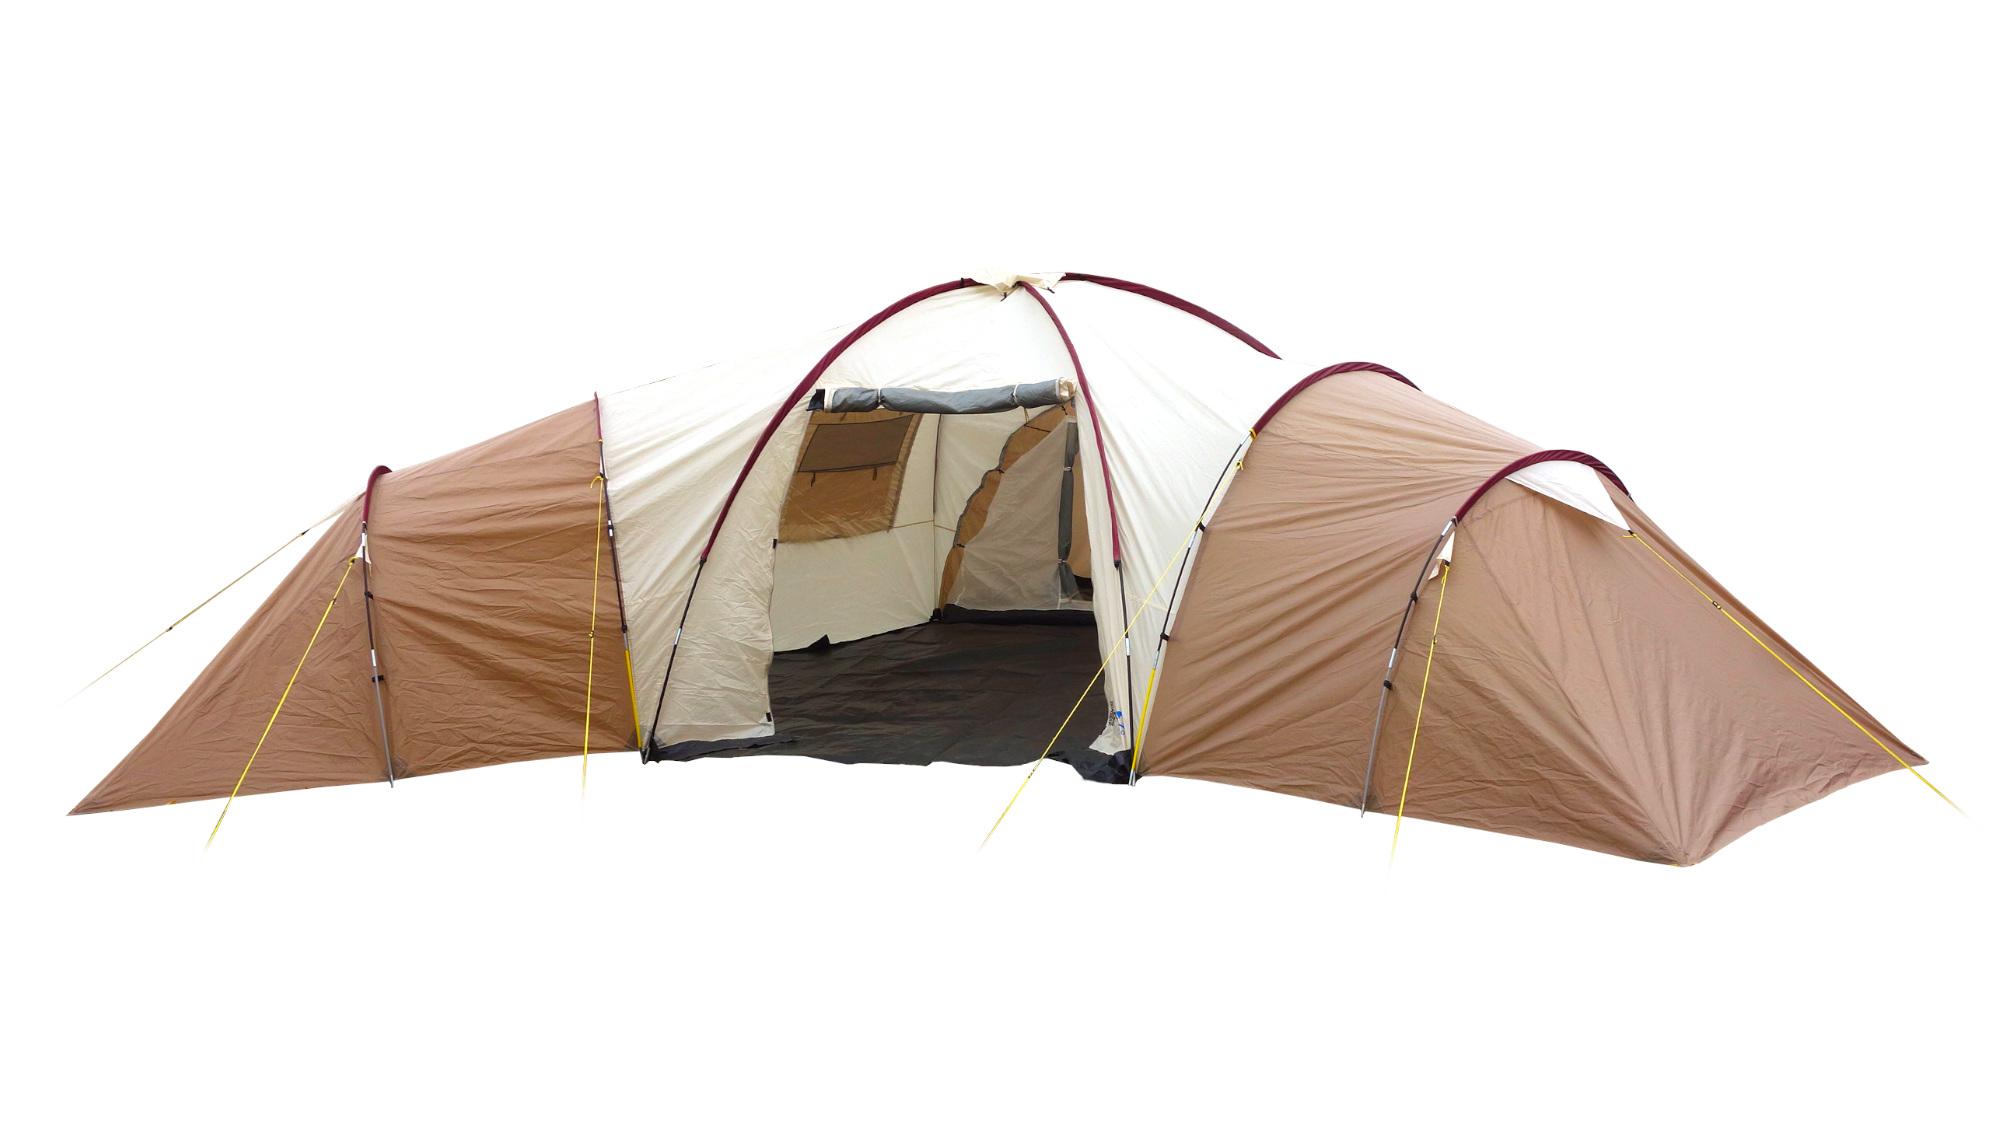 12 Personen Zelt leihen